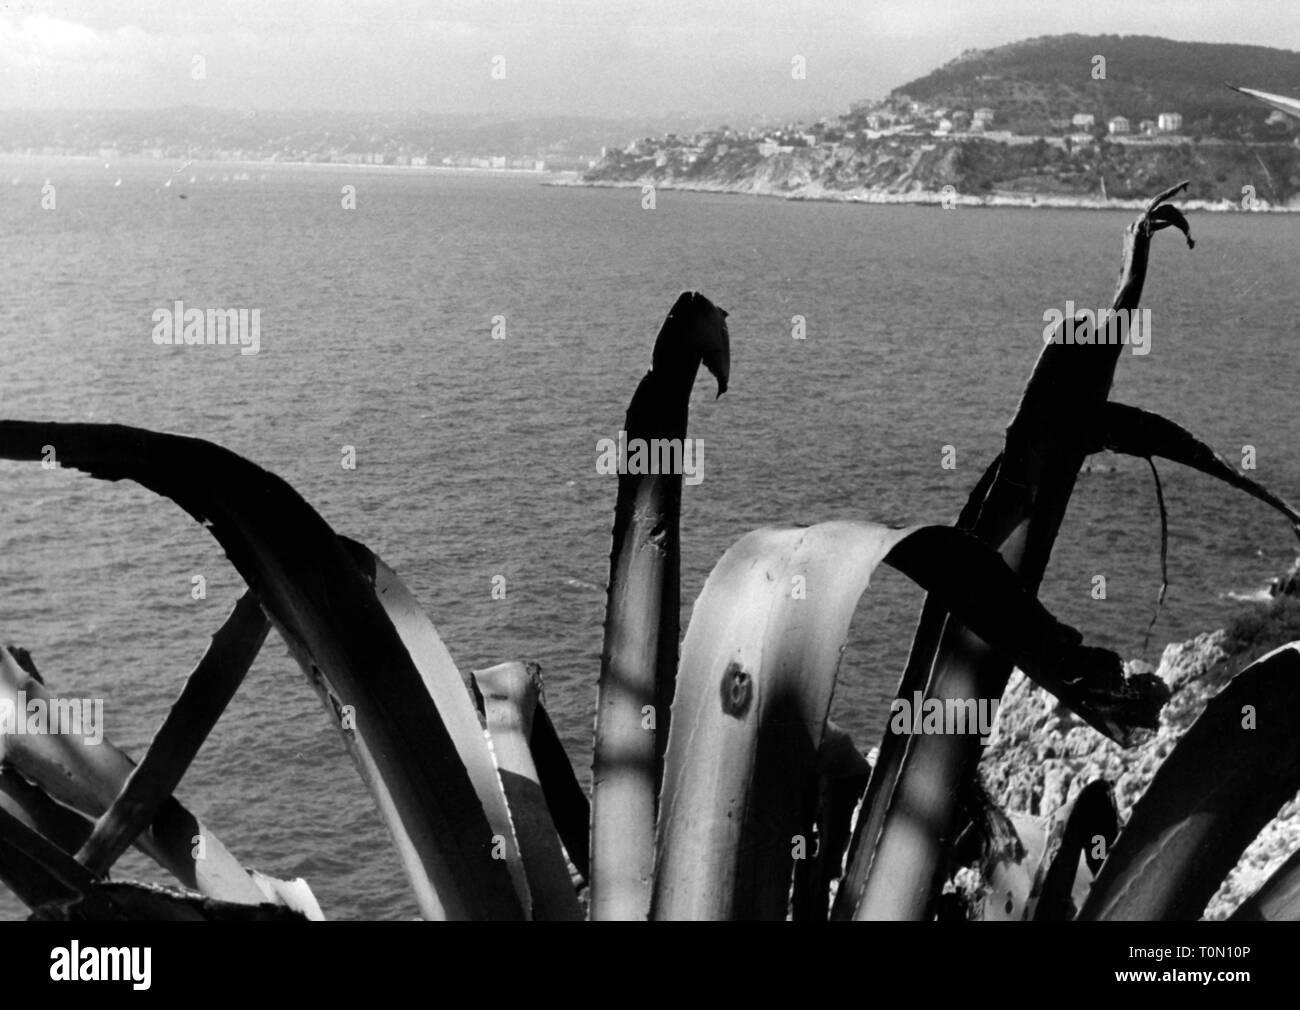 Geographie/Reisen, Monaco, Blick über das Meer, 1950er Jahre, Additional-Rights - Clearance-Info - Not-Available Stockbild